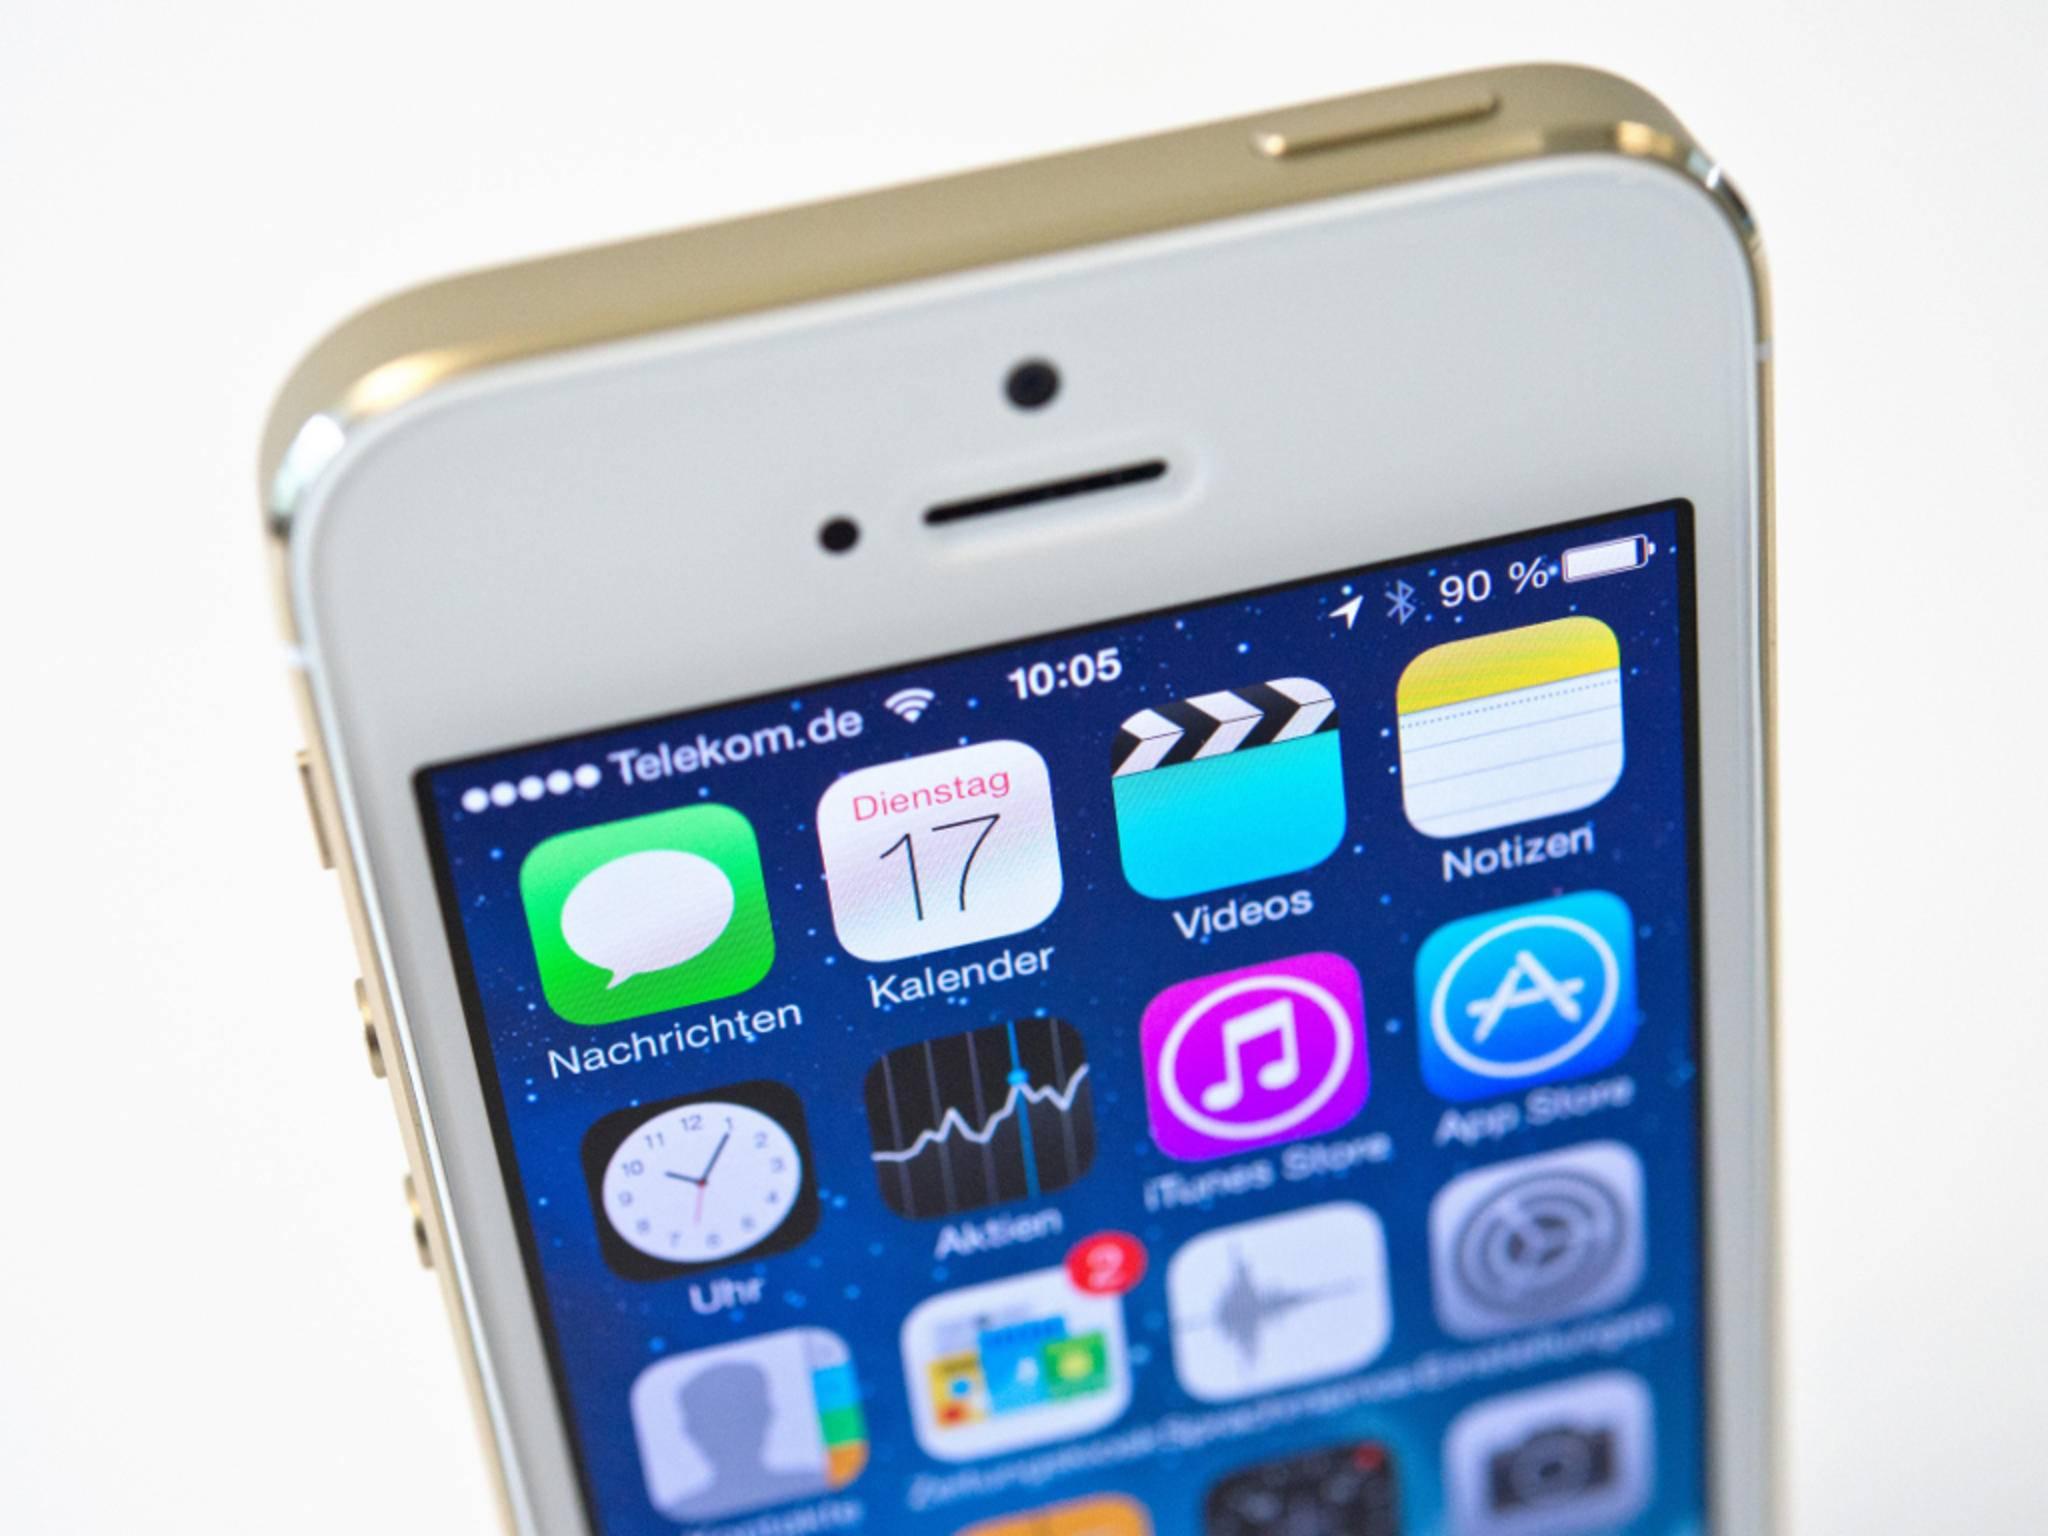 iOS-Oberfläche auf dem iPhone 5s